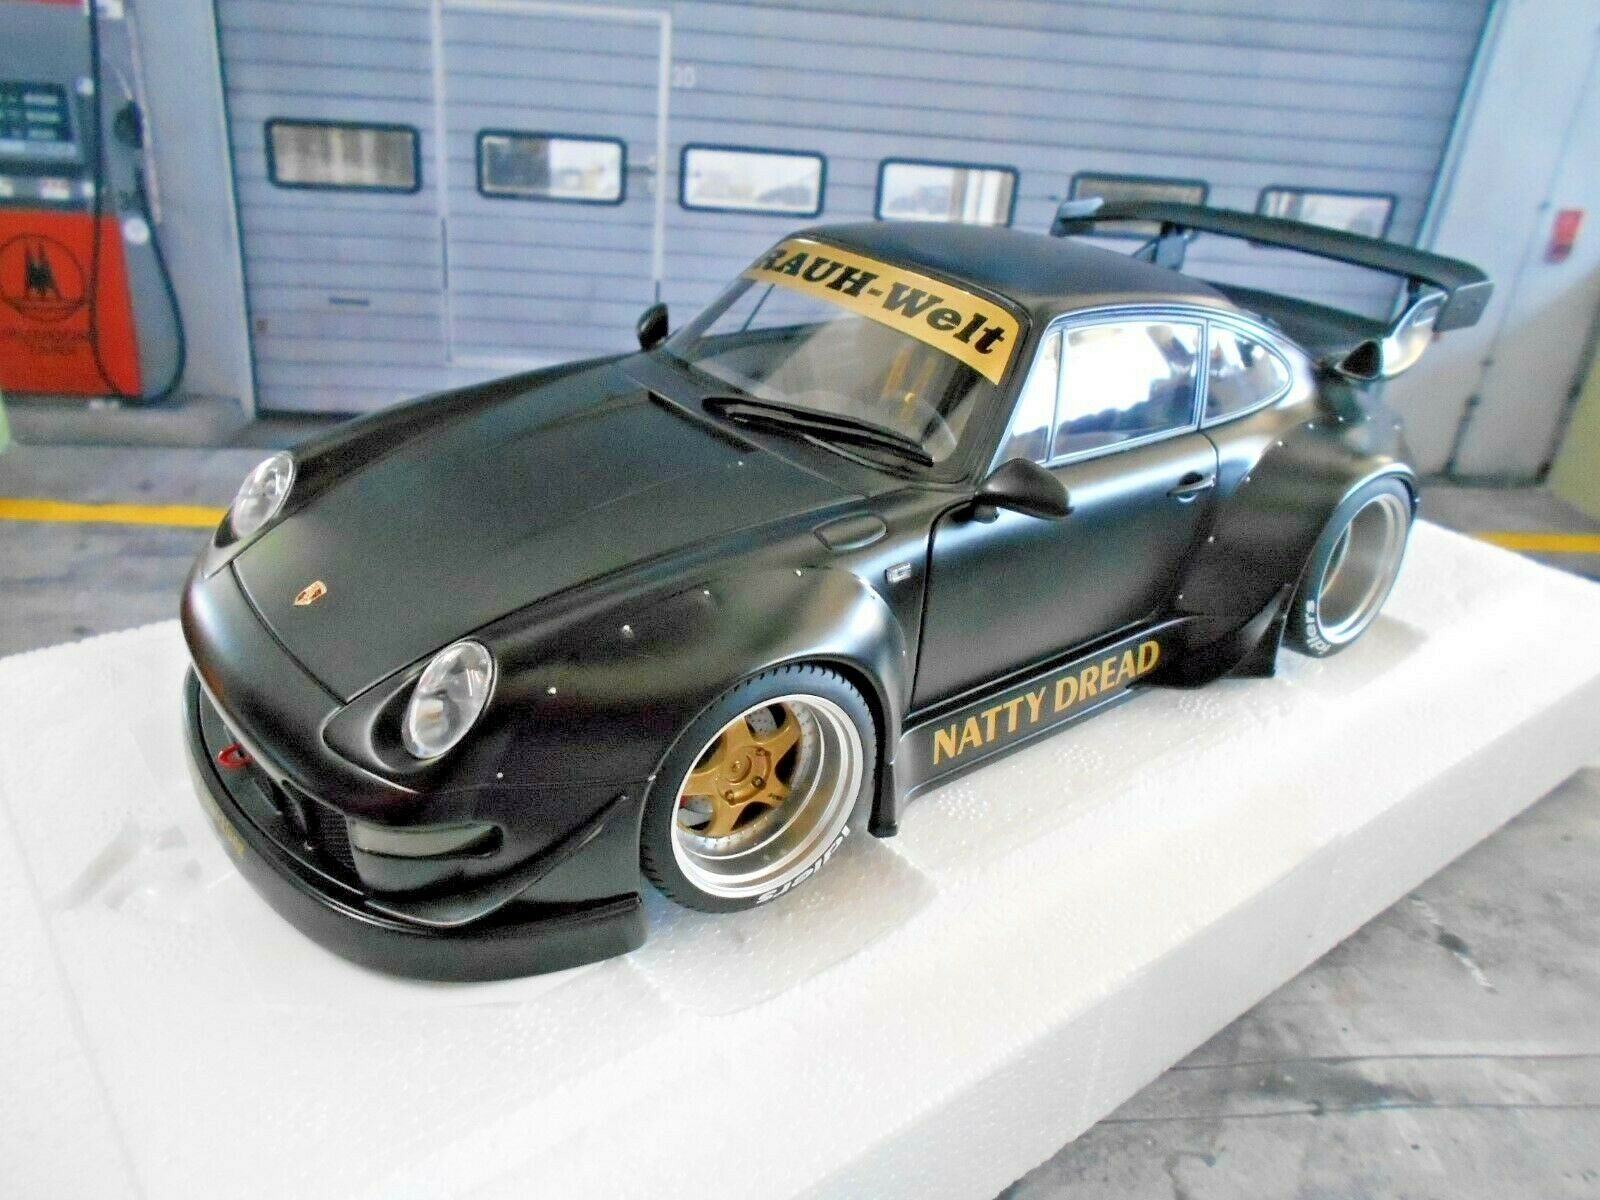 Porsche 911 993 rsr Widebody RWB brumoso mundo negro mate Autoart 78154 rar 1 18